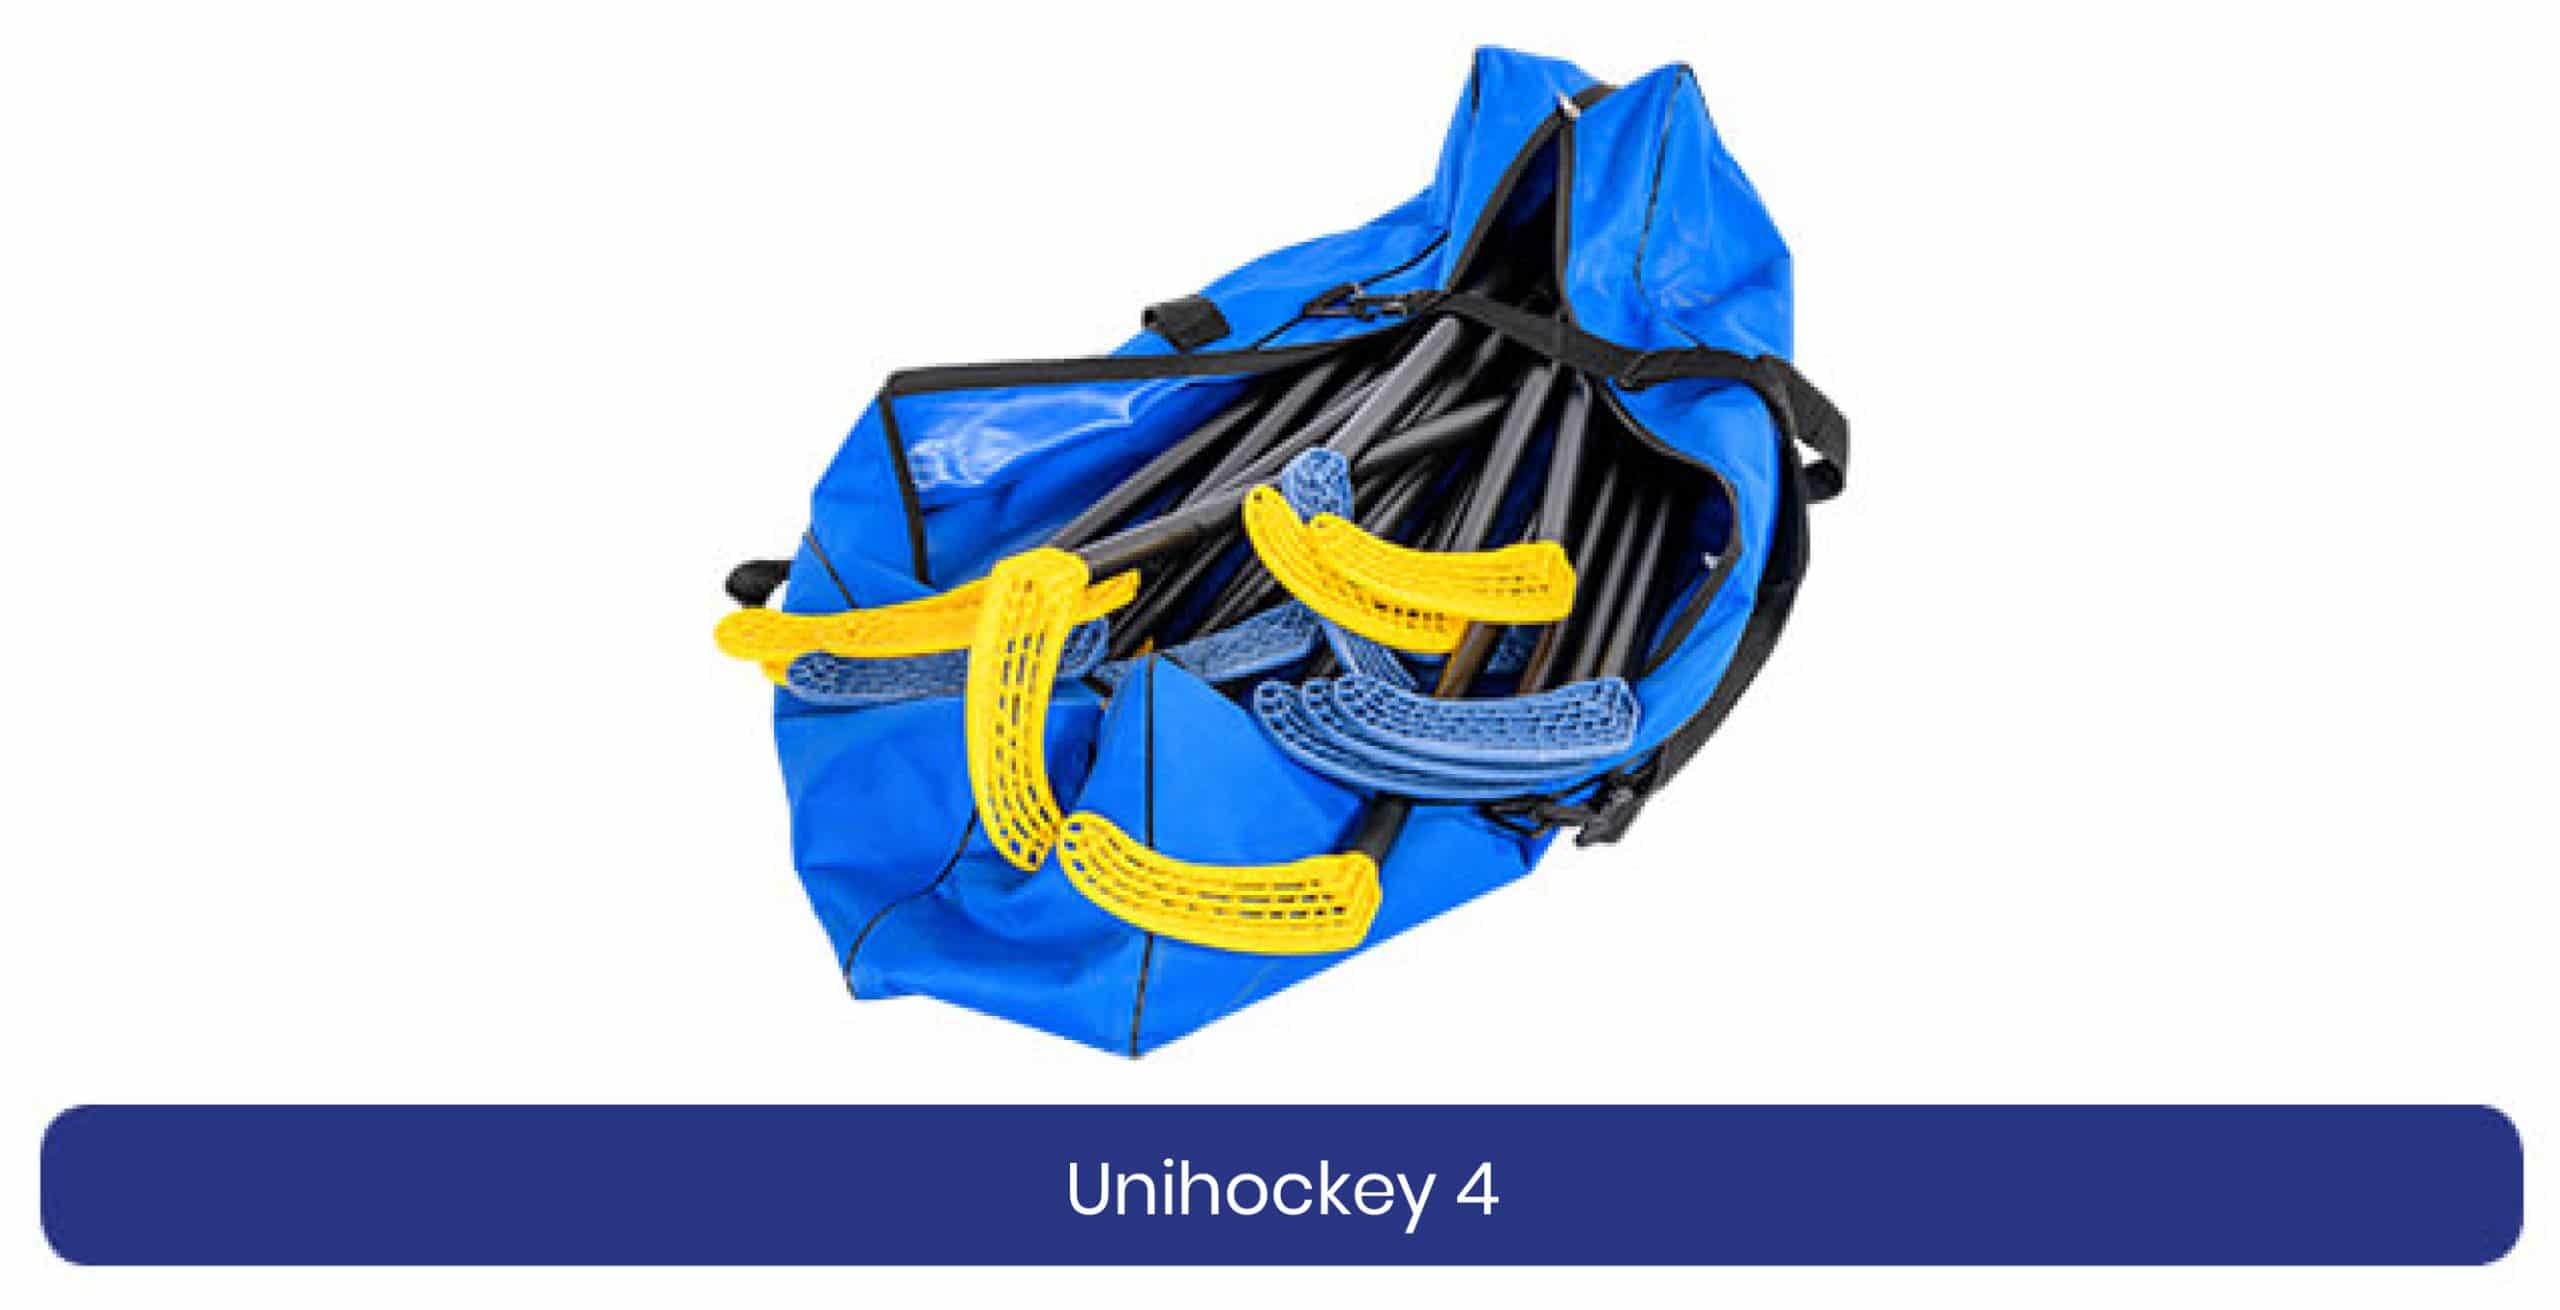 Unihockey 4 lenen product